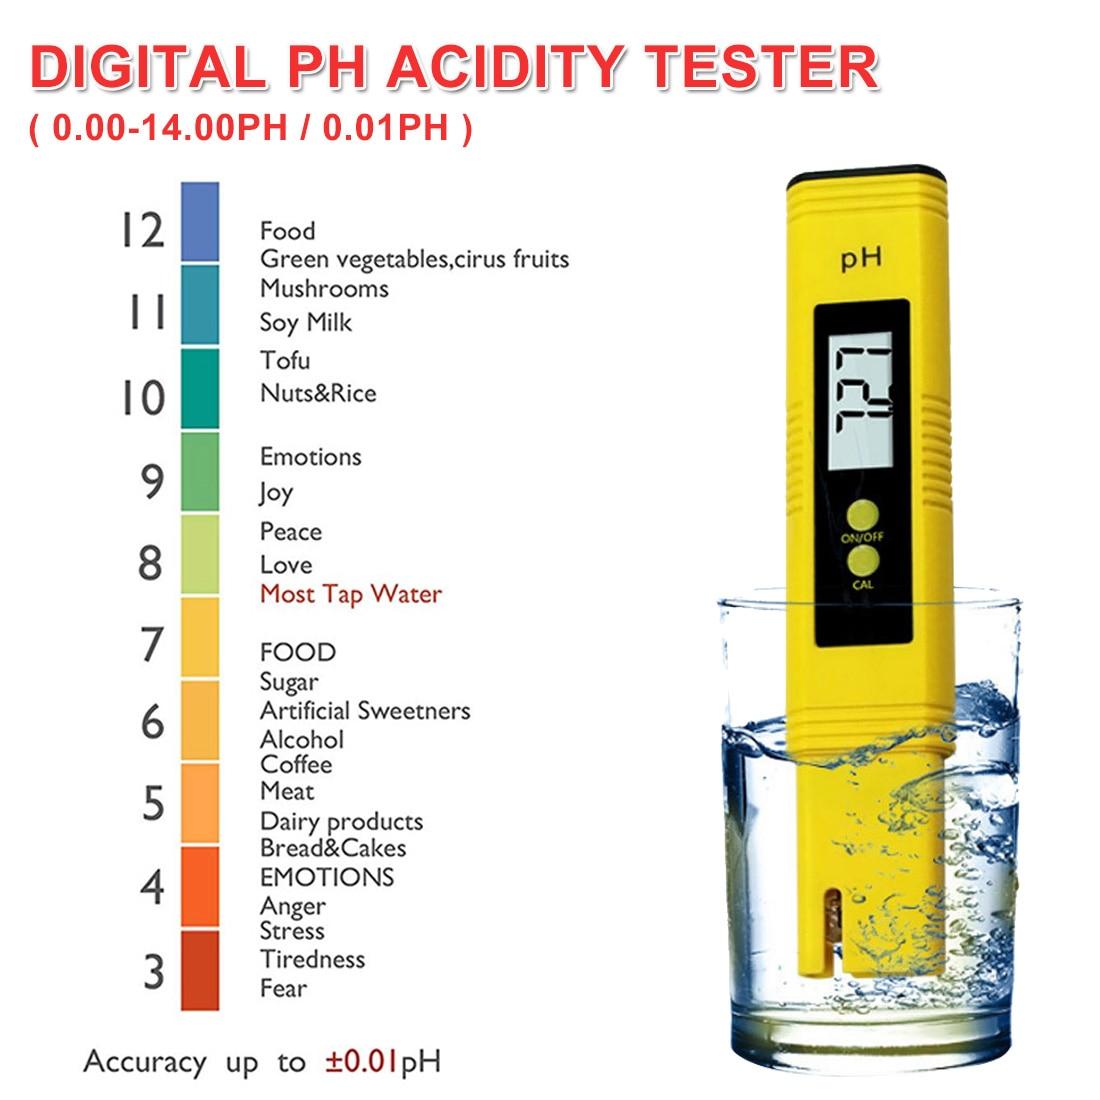 Large LCD Display Digital PH Meter Tester for Water Food Aquarium Pool Hydroponics Pocket Size Pen Type PH Tester Accuracy 0.01 pocket vibrometer pen type vibration meter tester gauge analyzer measure precision sensitivity accelerometers smartsensor as63d